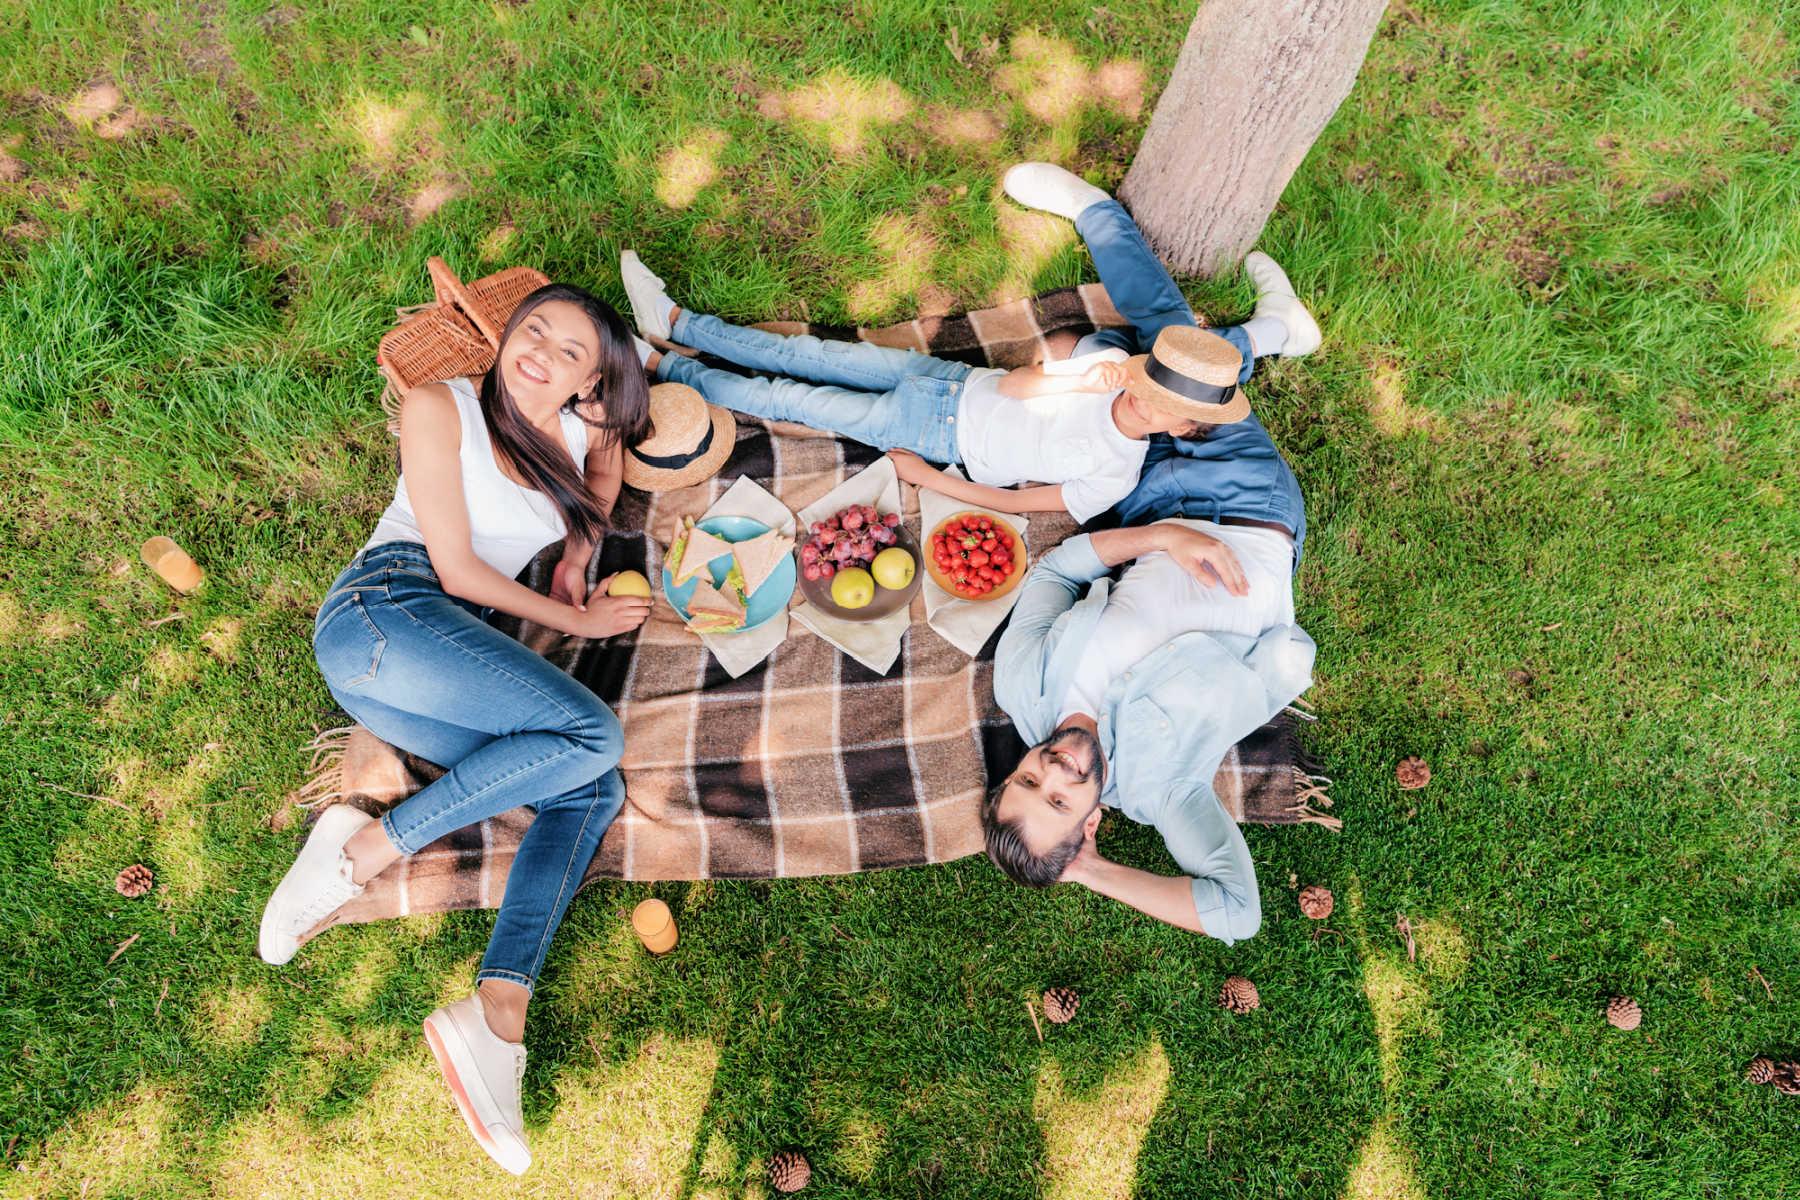 lake-macquarie-picnic-spots-main